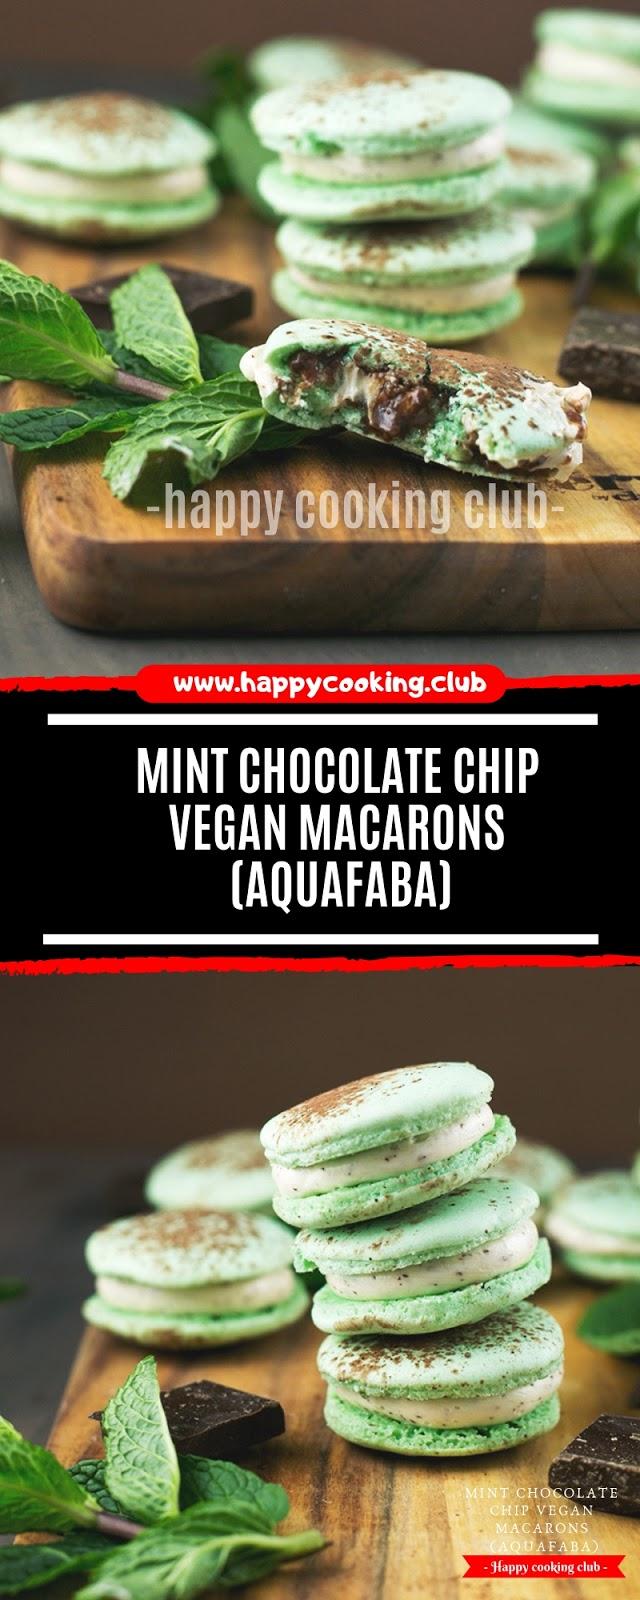 MINT CHOCOLATE CHIP VEGAN MACARONS (AQUAFABA)